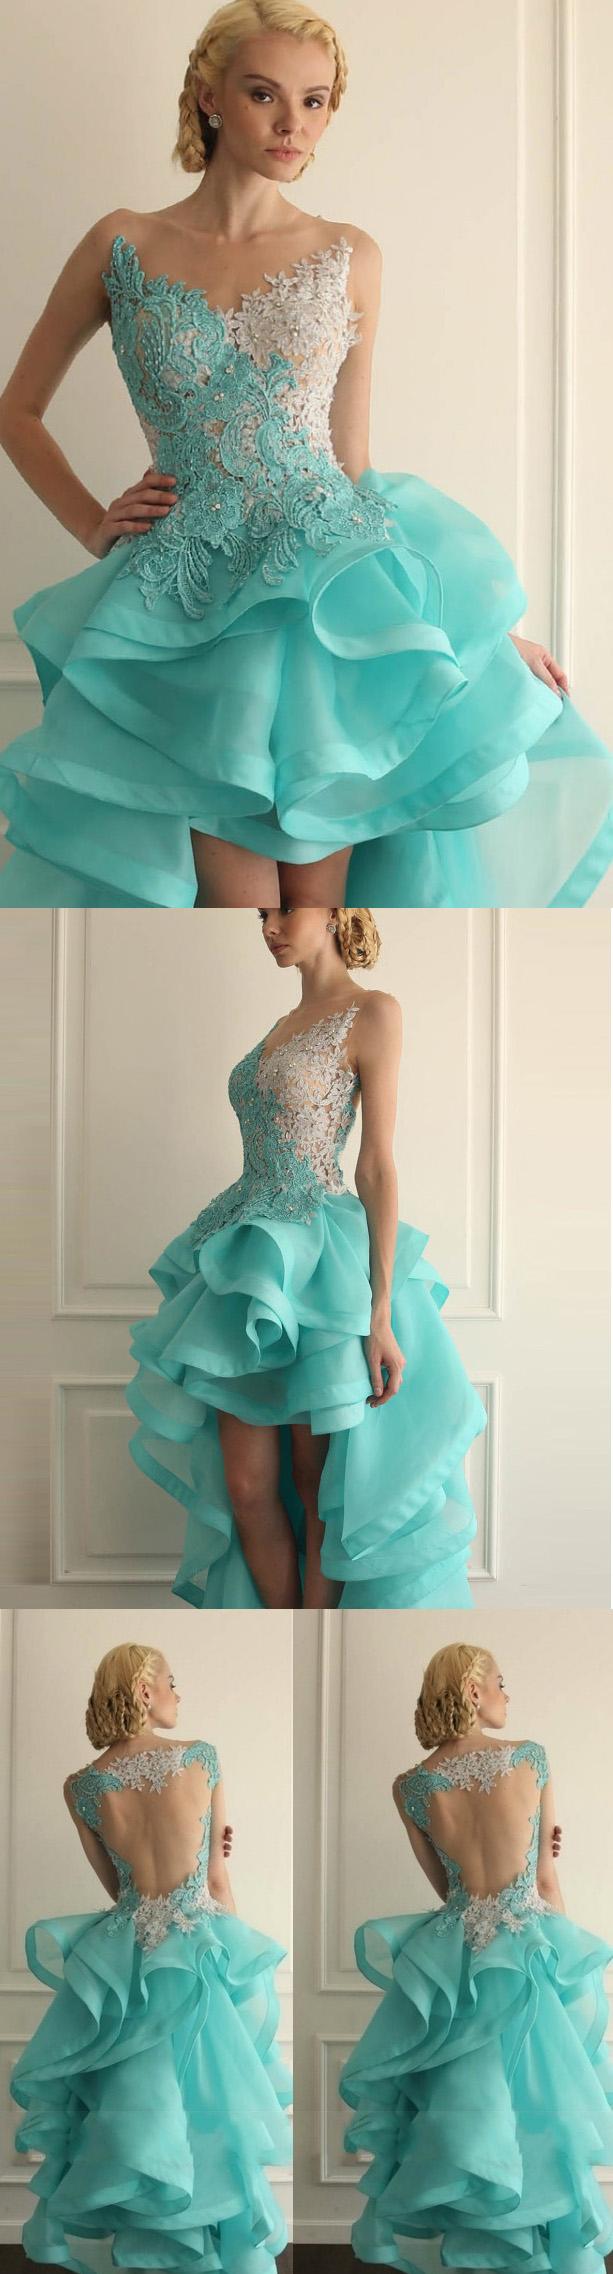 Light Blue Homecoming Dresses, Short Homecoming Dresses, Short ...